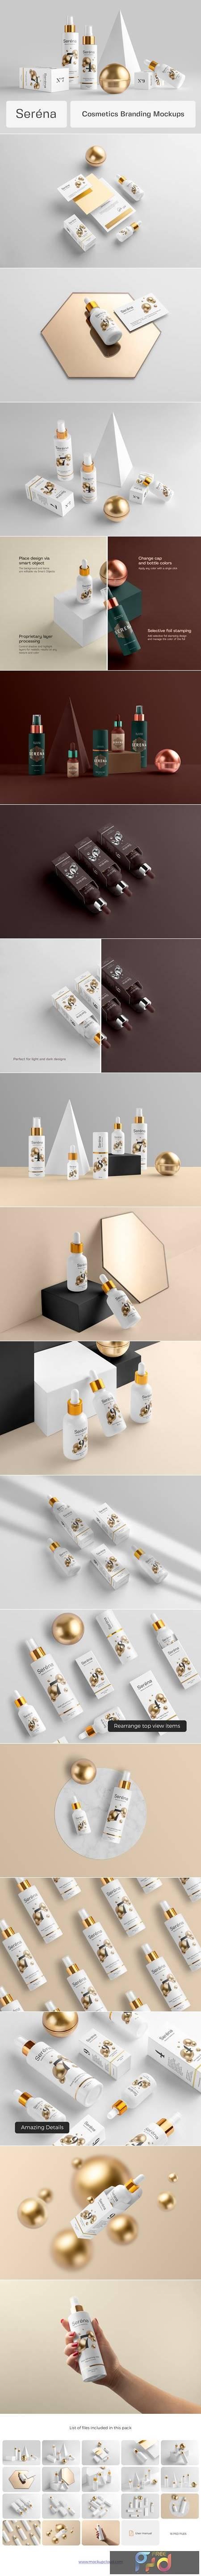 Serena – Cosmetics Branding Mockups Vol2 4767948 1